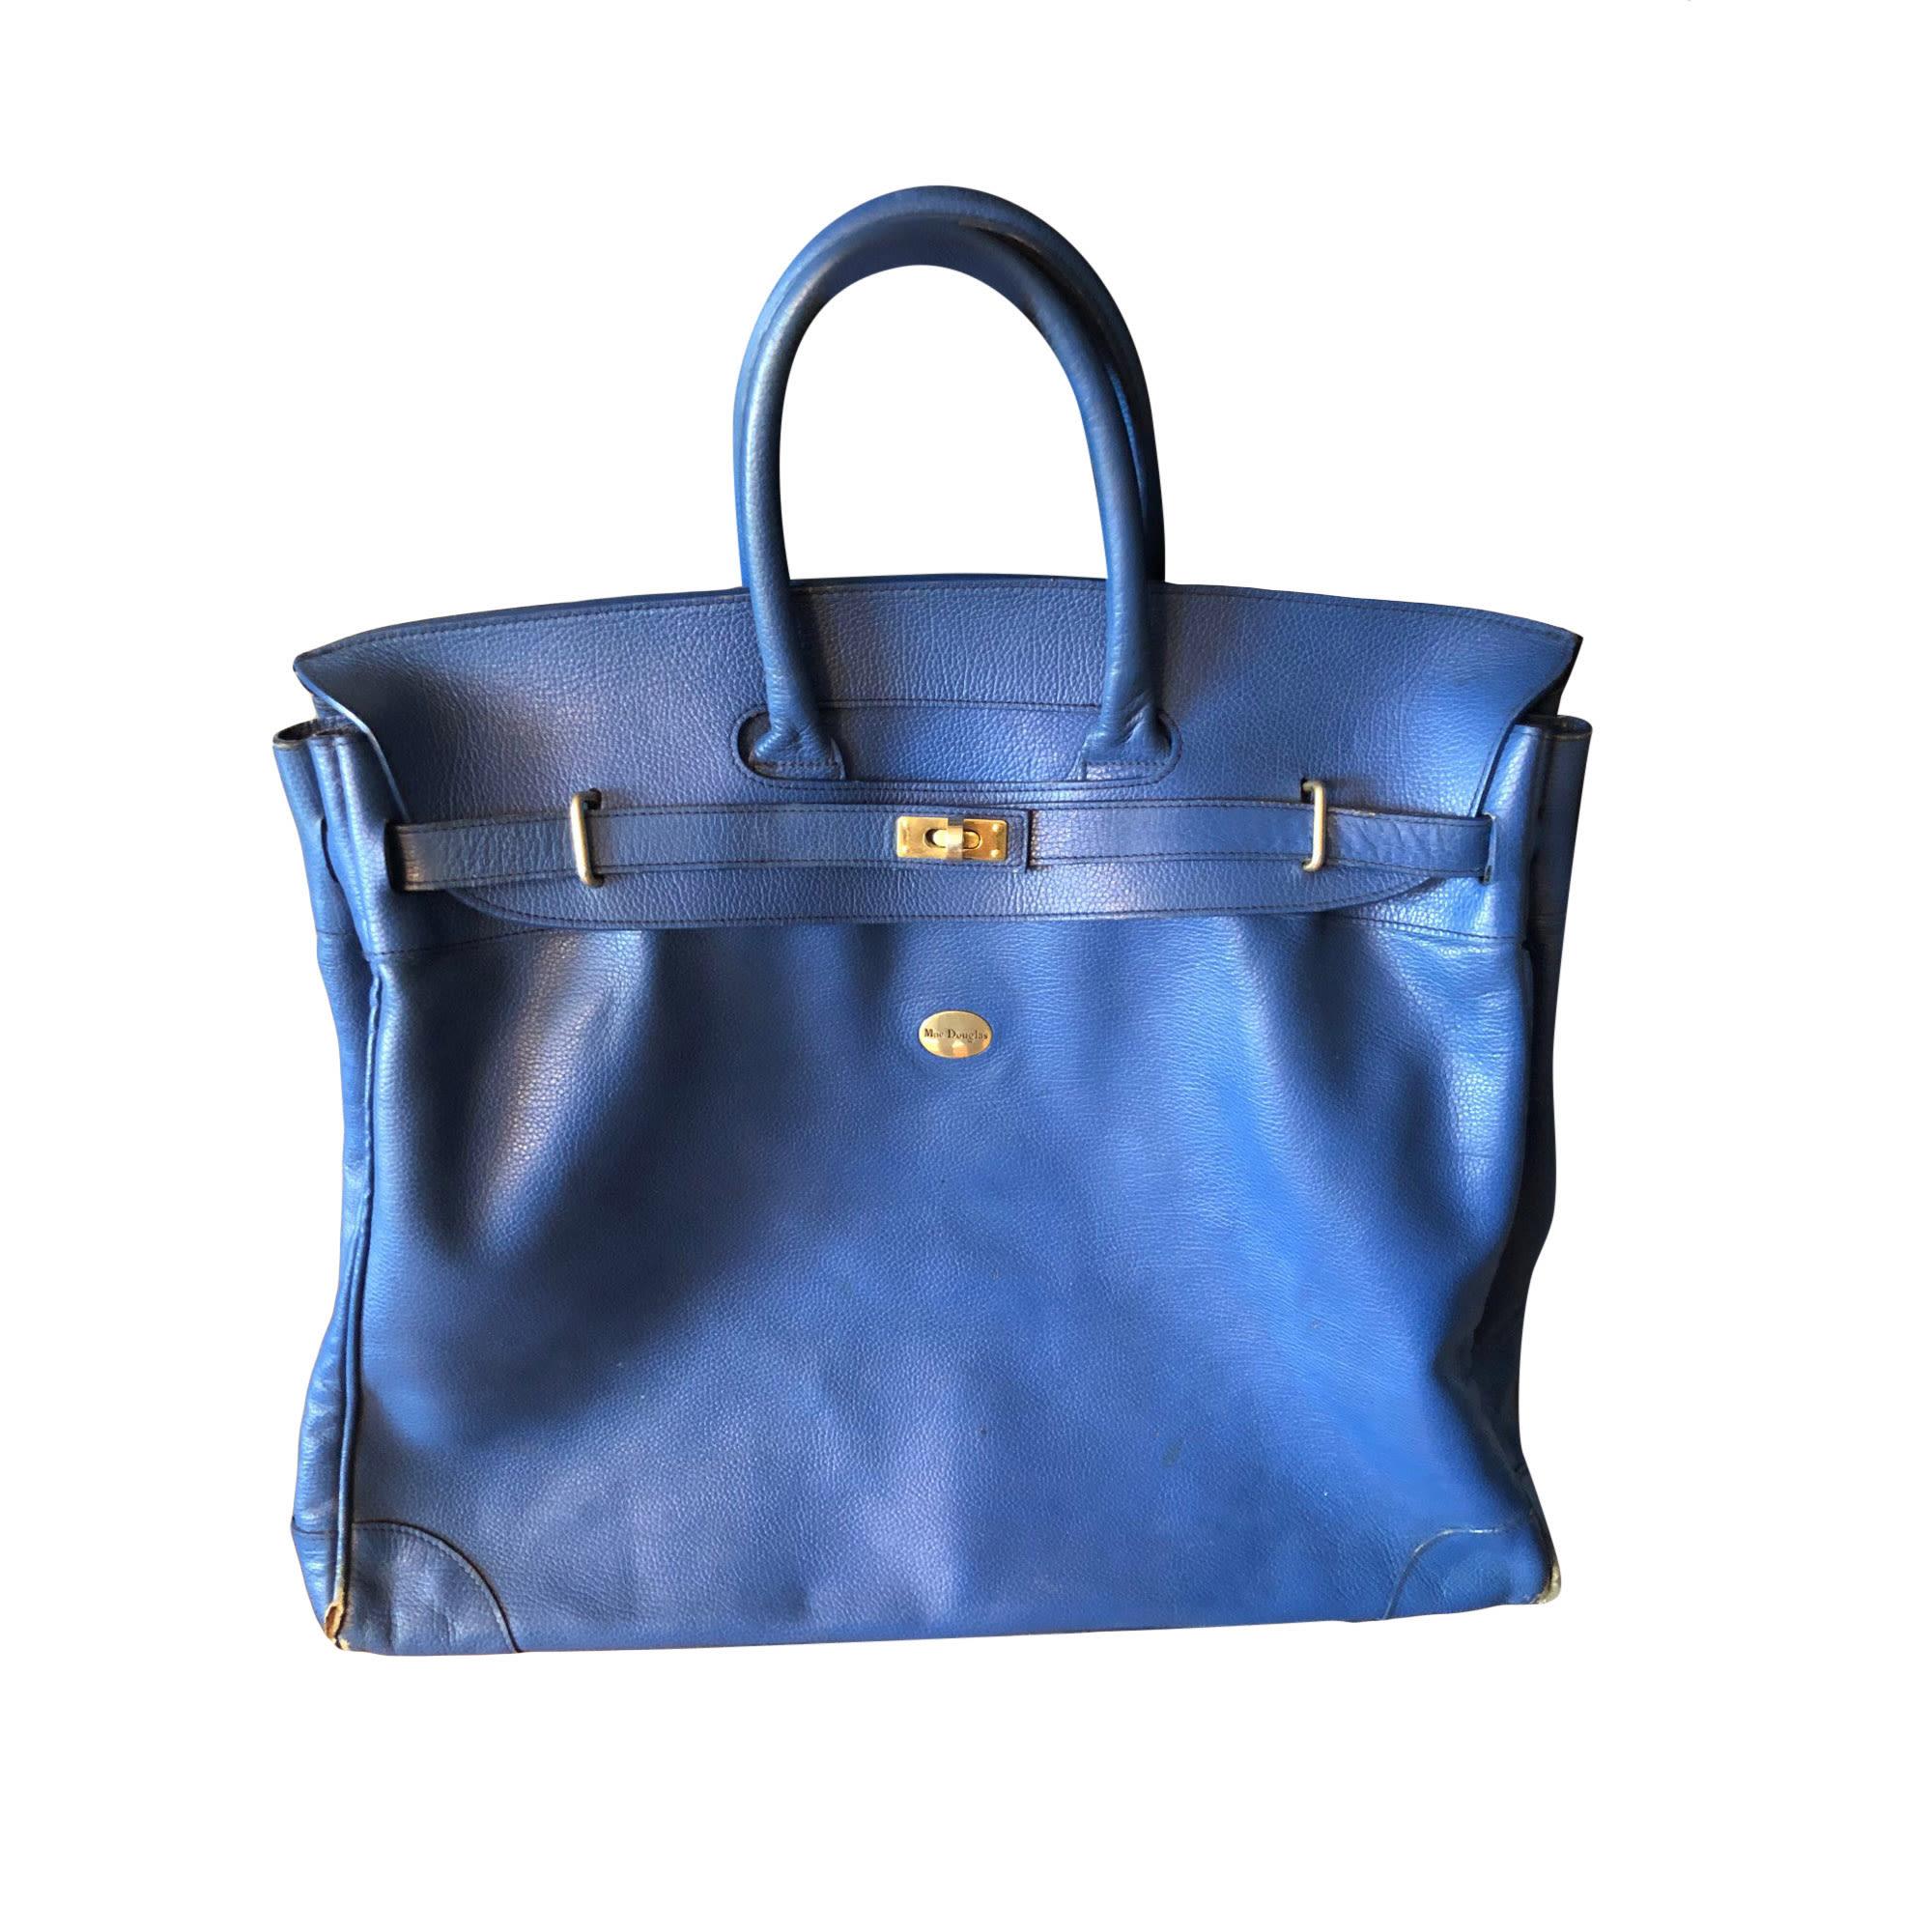 Sac XL en cuir MAC DOUGLAS Bleu, bleu marine, bleu turquoise